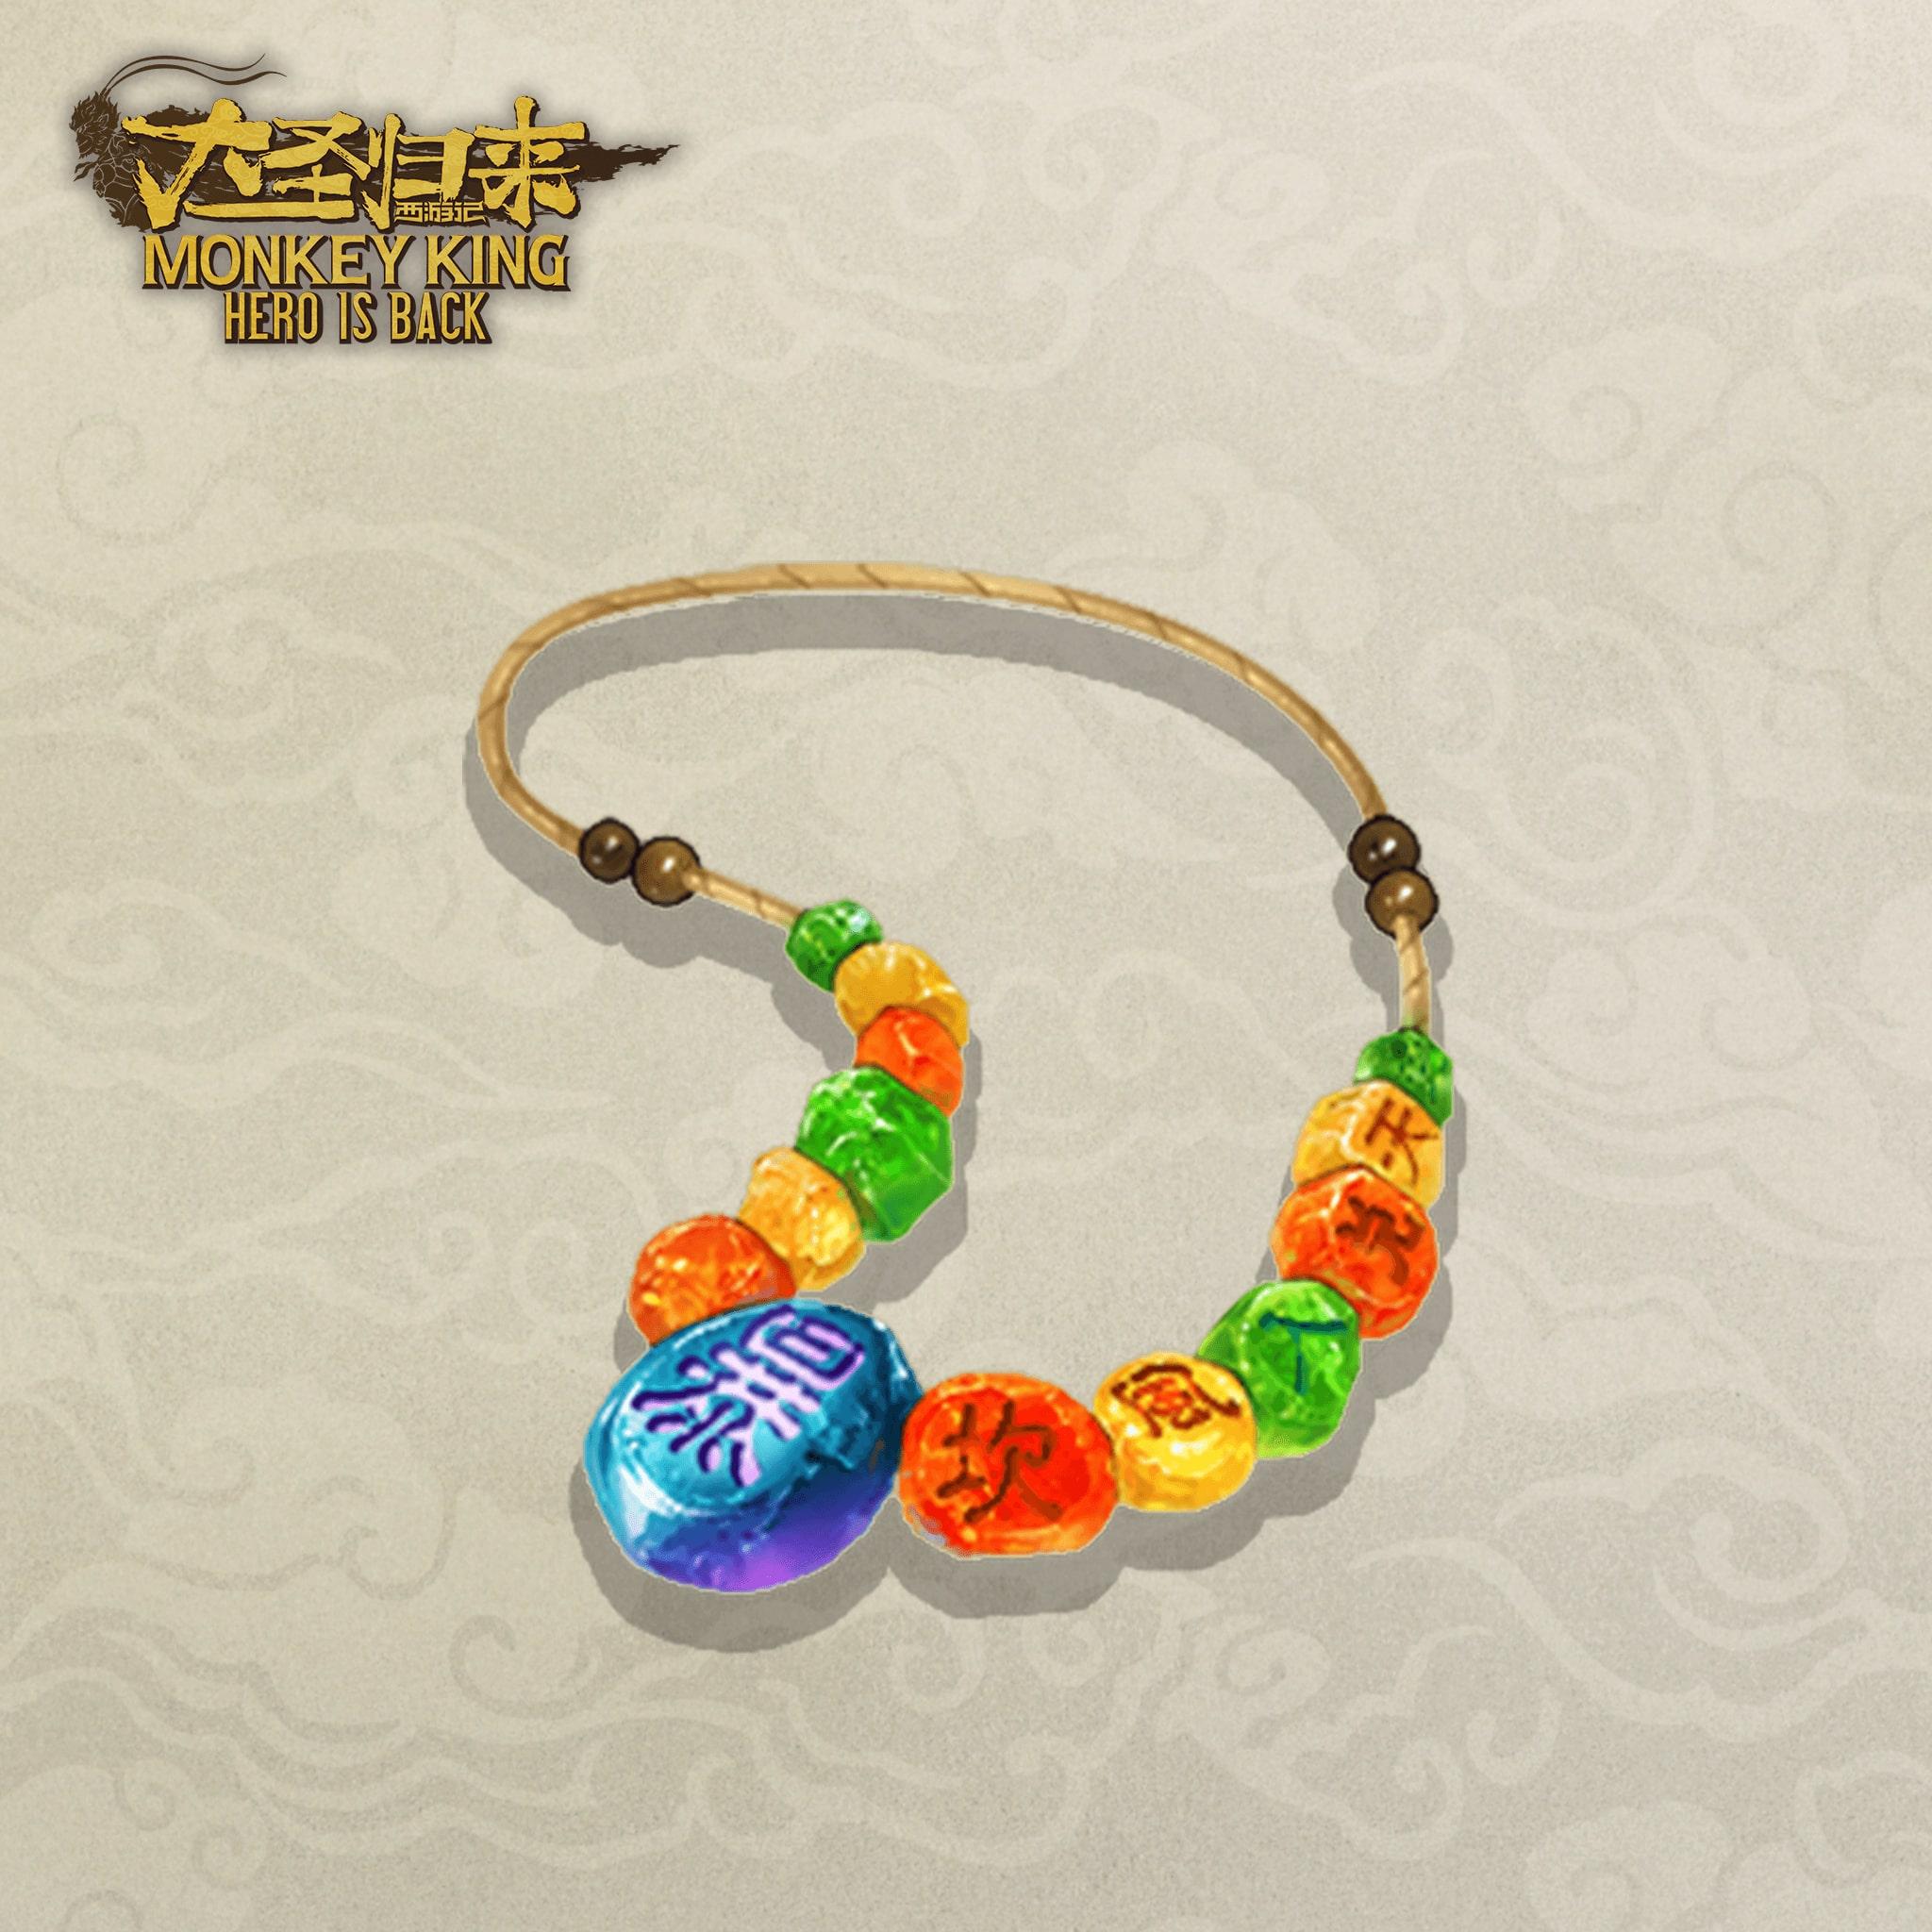 Monkey King Soul Charming Necklace